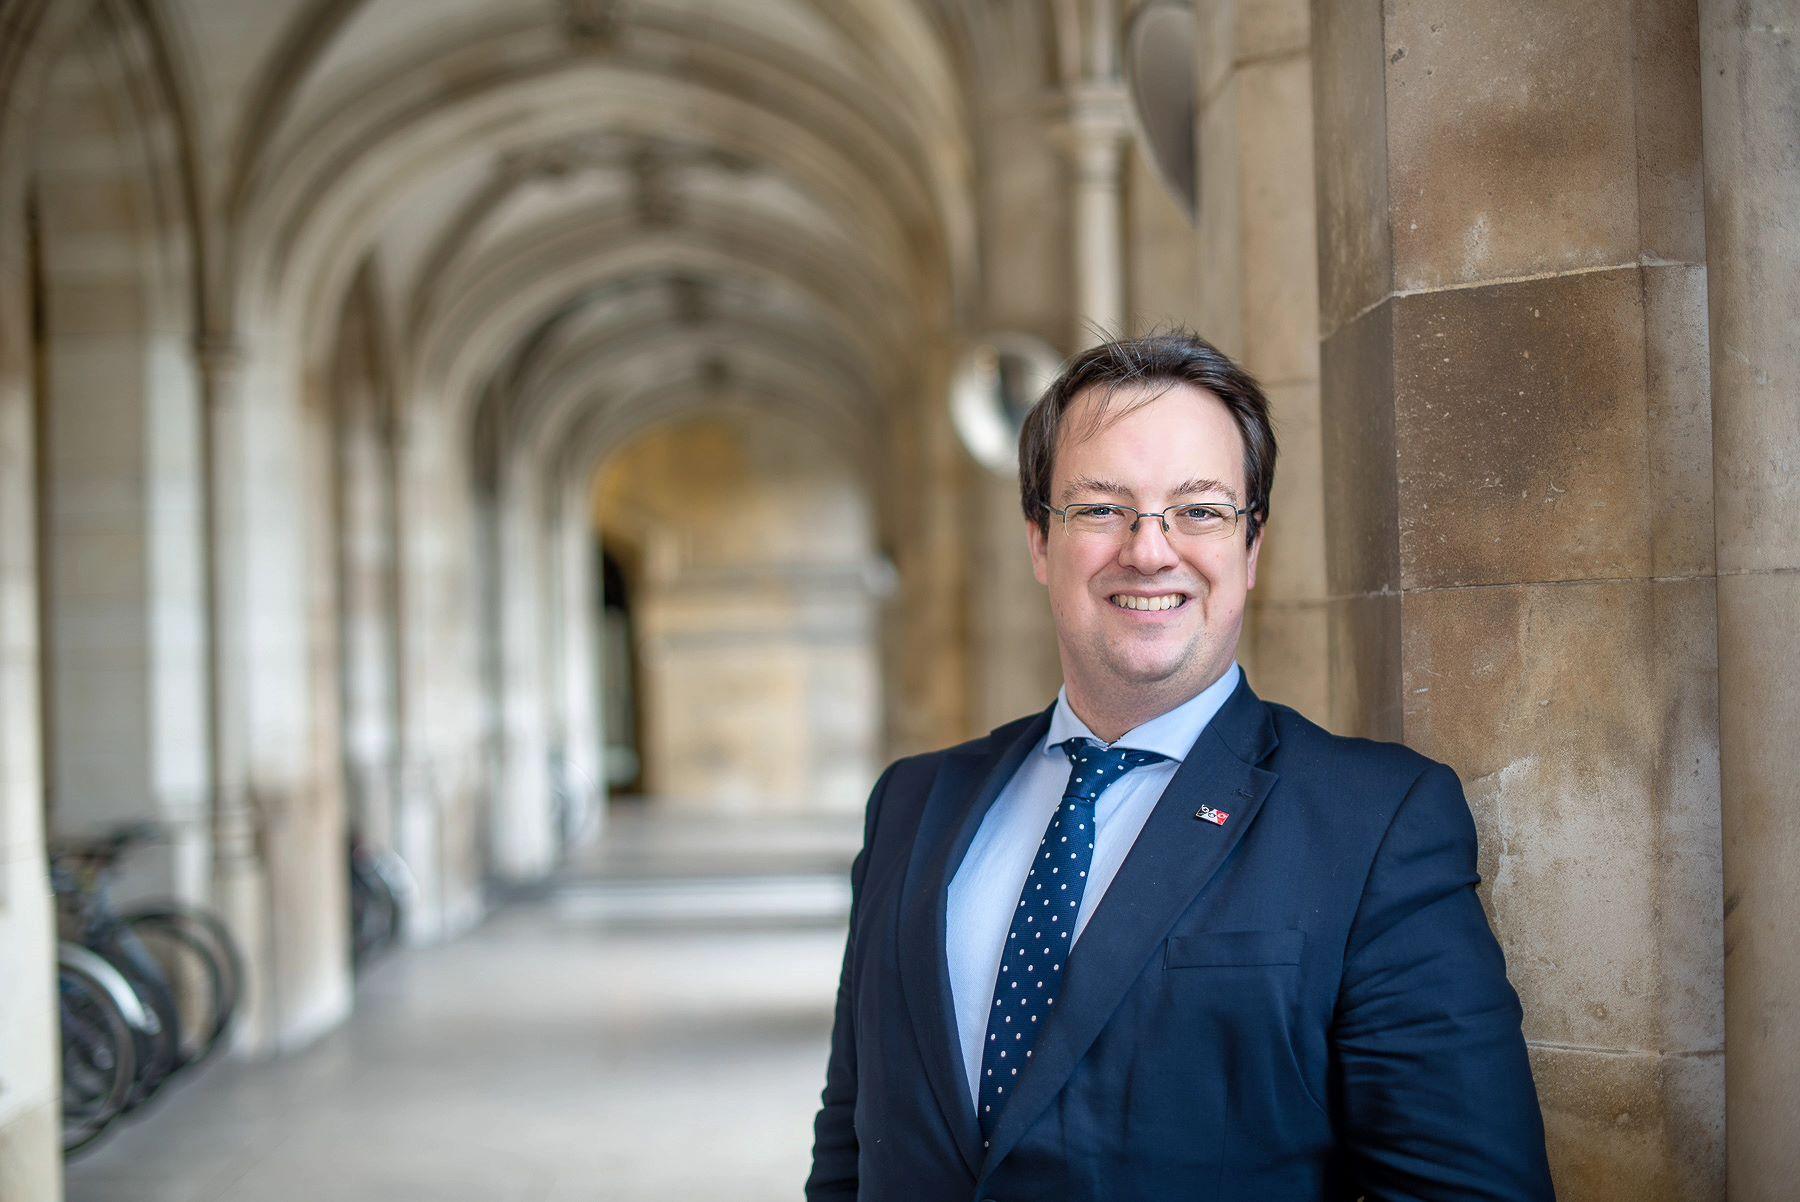 Mike in Collonades in Parliament